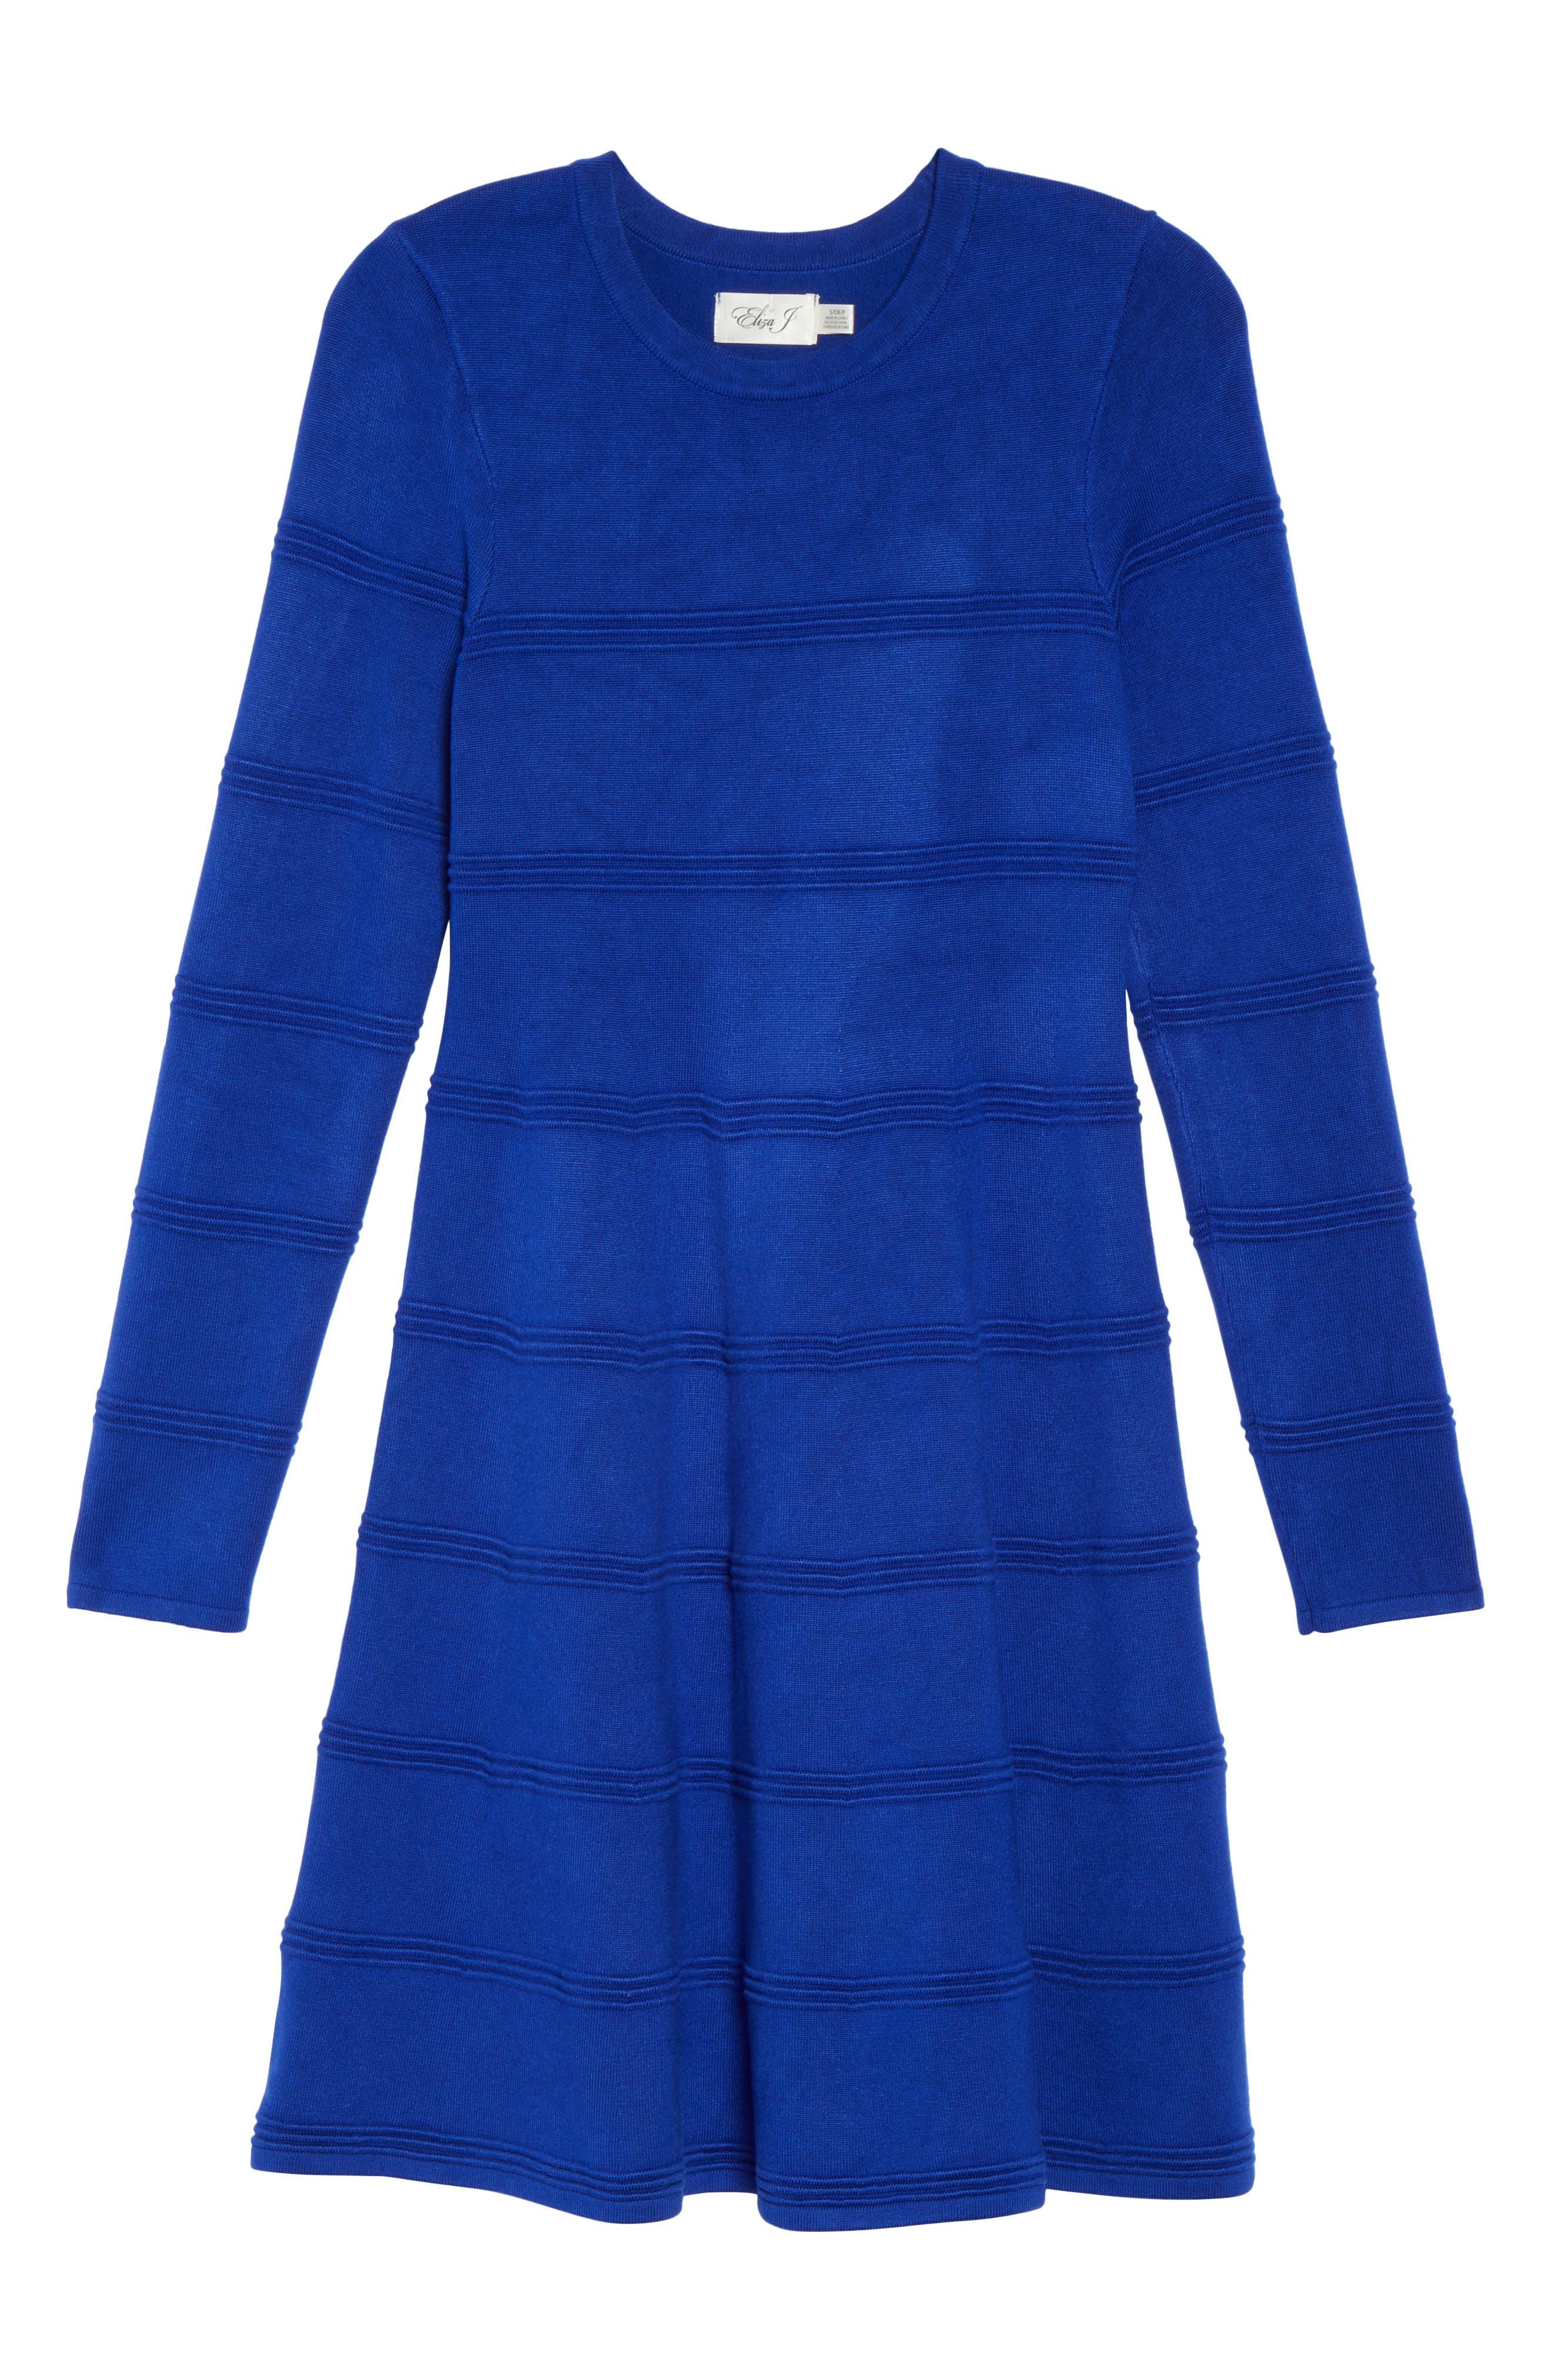 A-Line Sweater Dress,                             Alternate thumbnail 6, color,                             COBALT